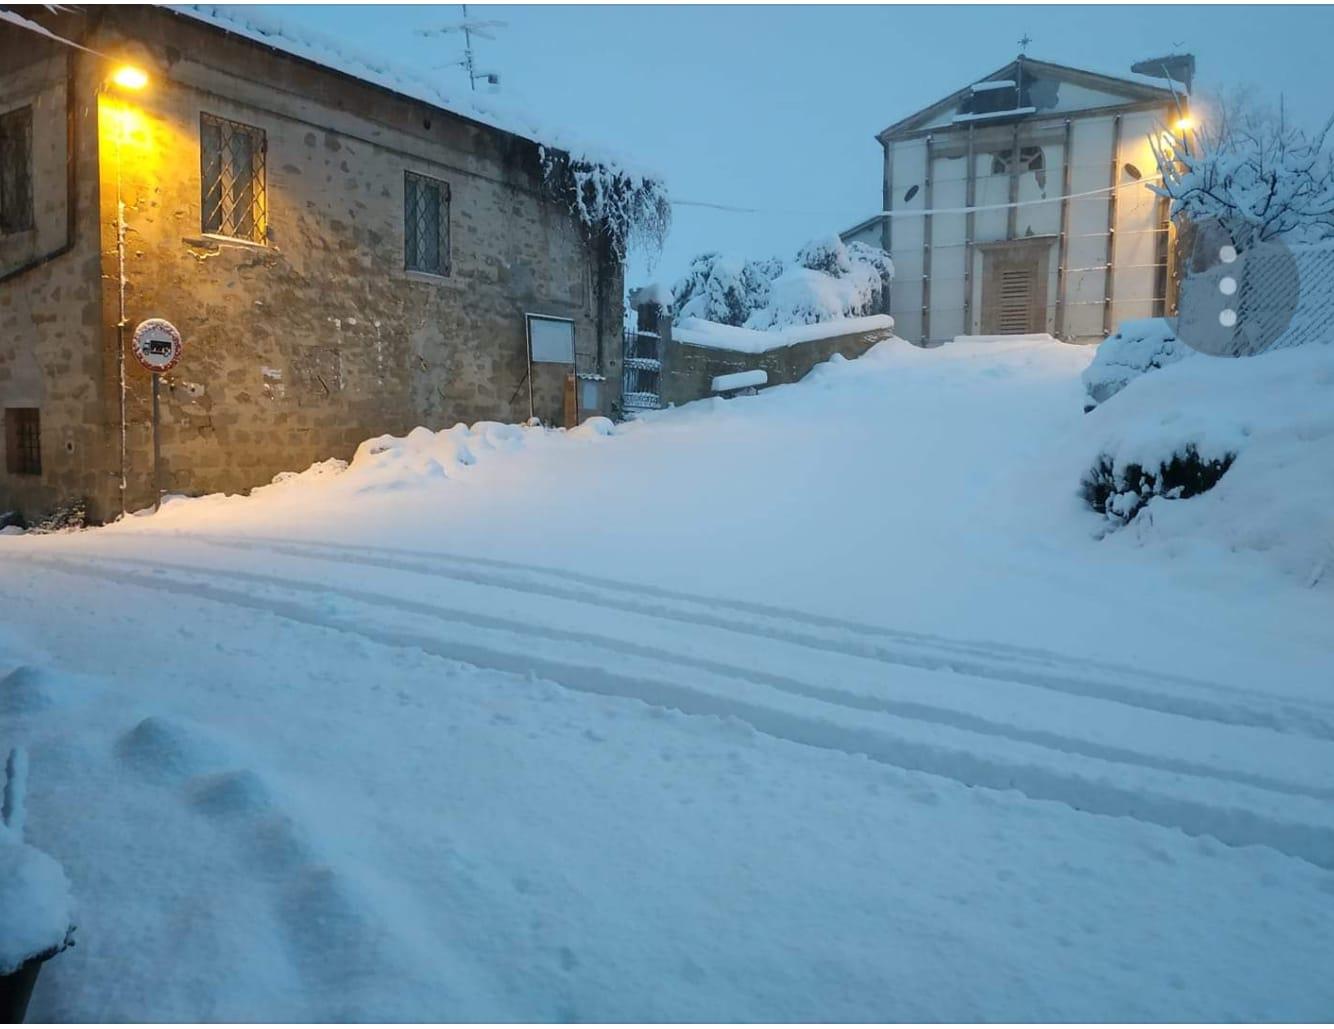 La neve avvolge Maceratese e Anconetano, disagi soprattutto